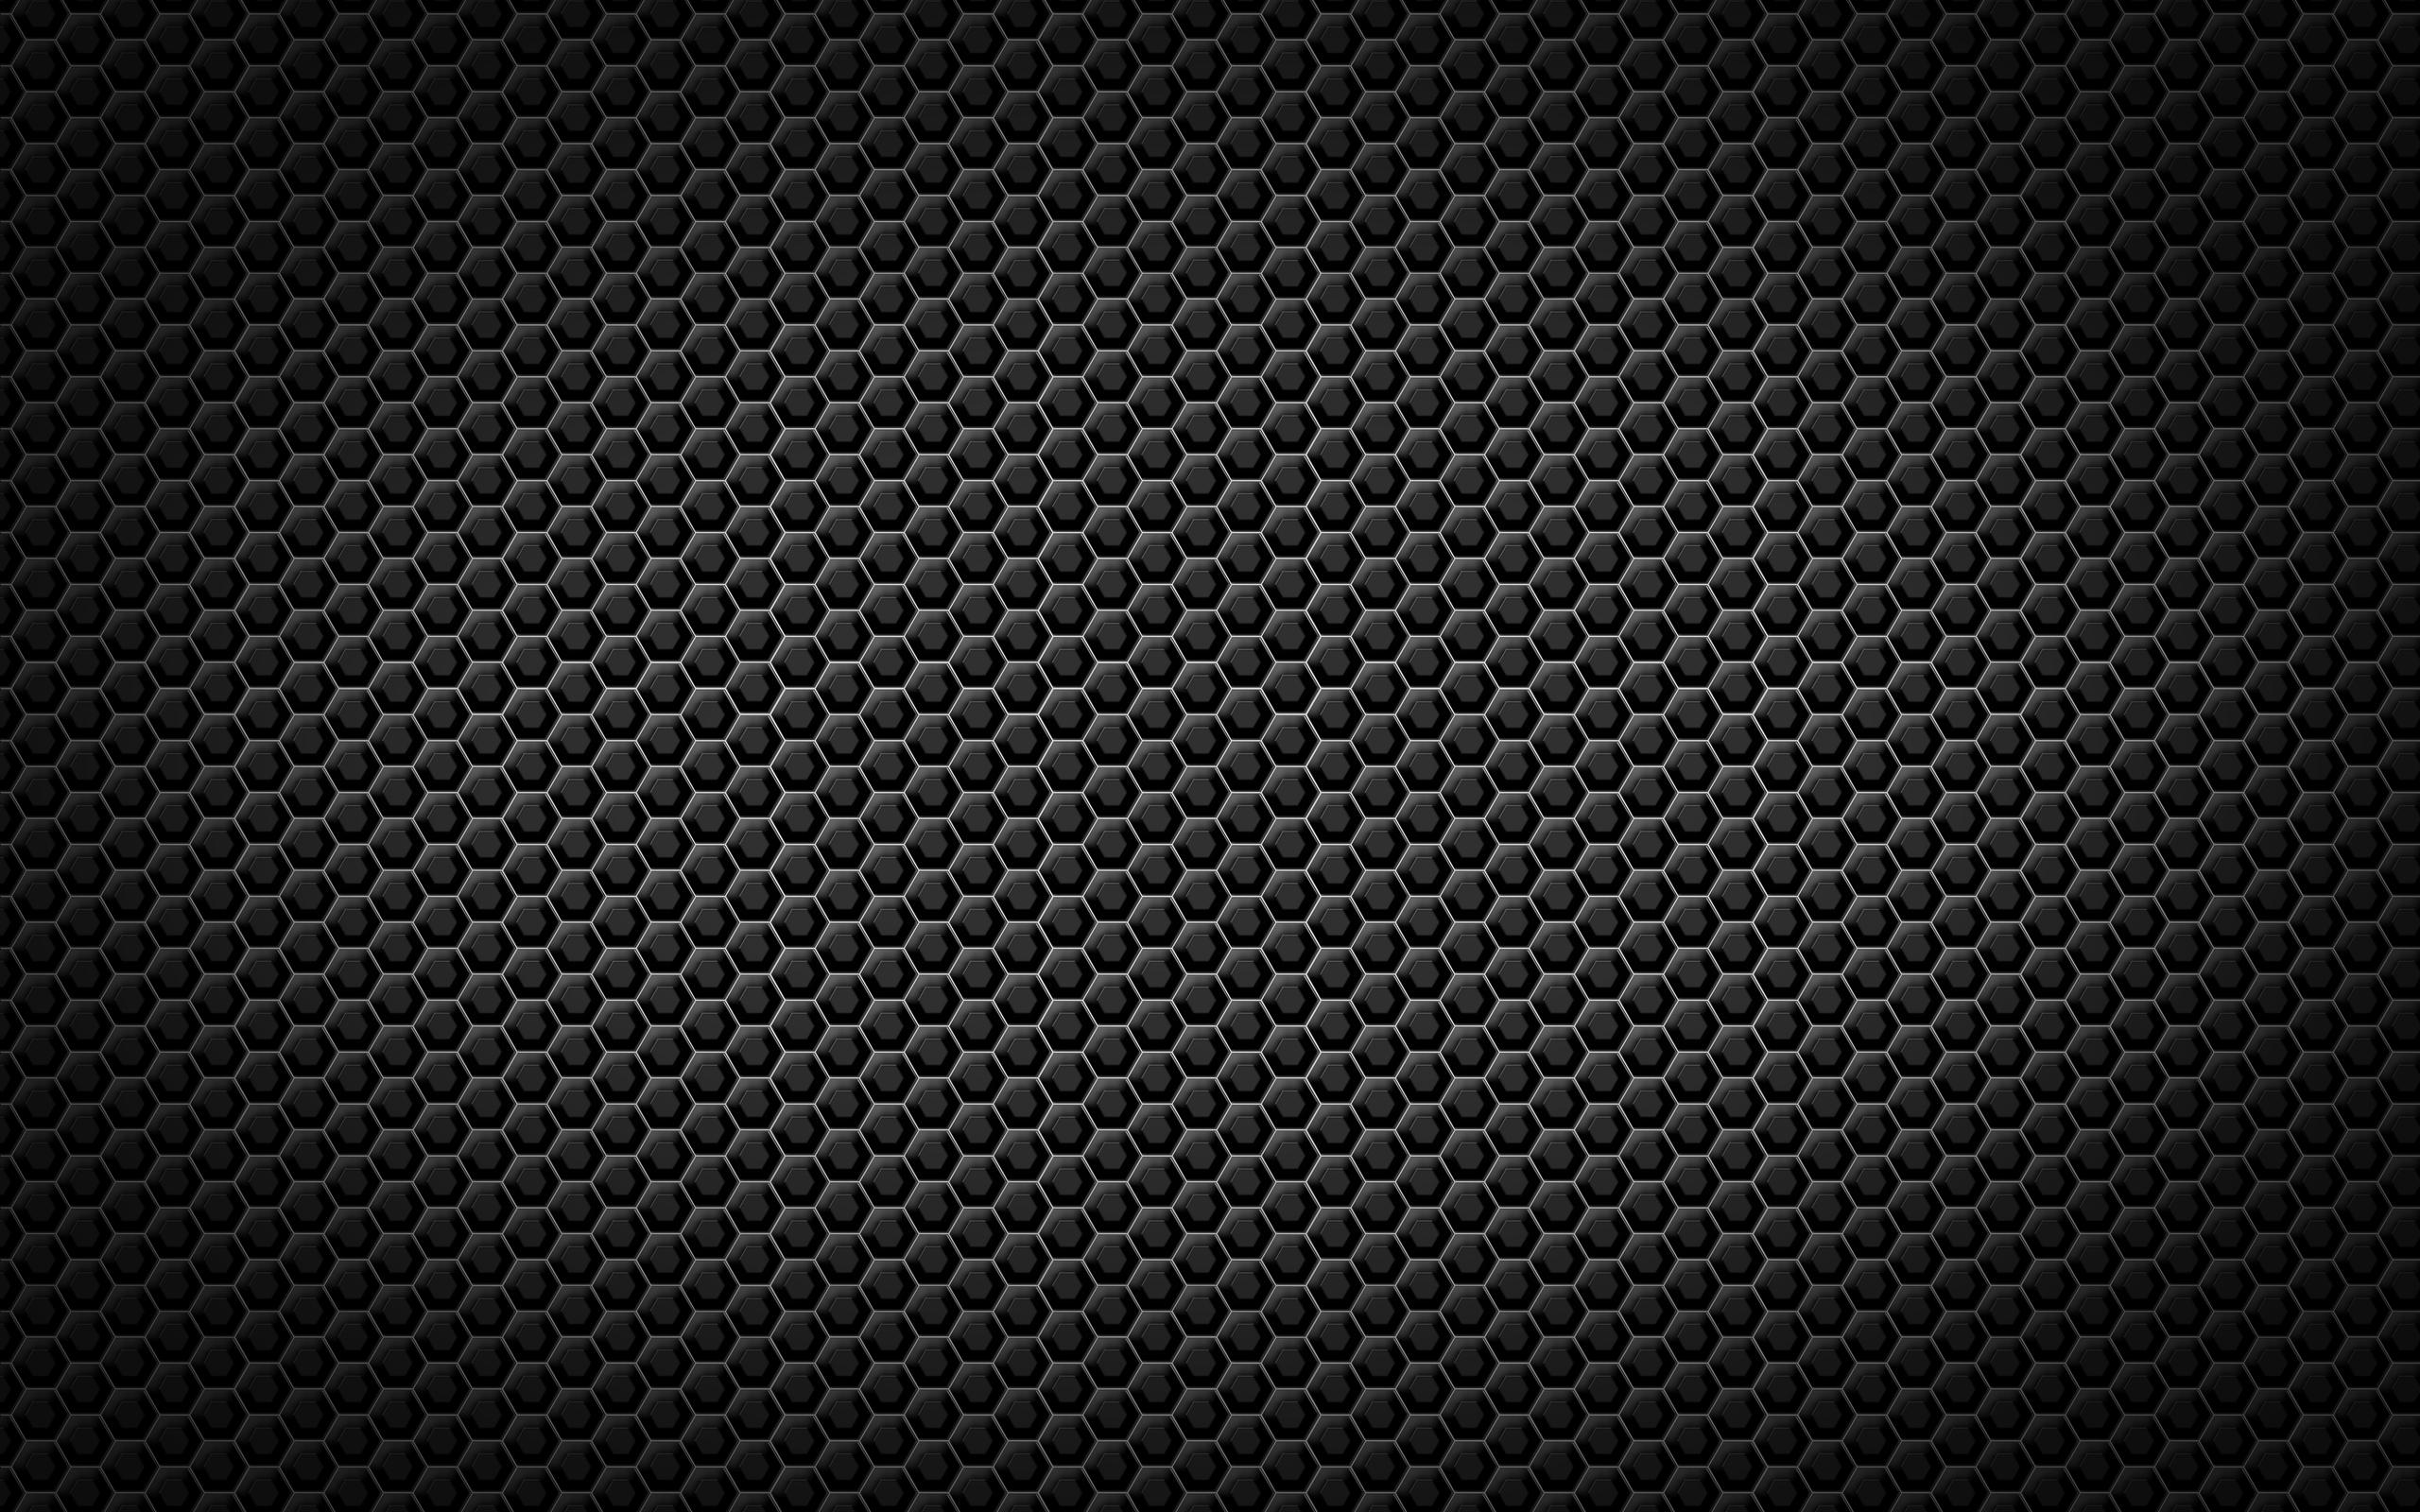 April Calendar Desktop Wallpaper : Basic grey desktop wallpaper wallpapersafari